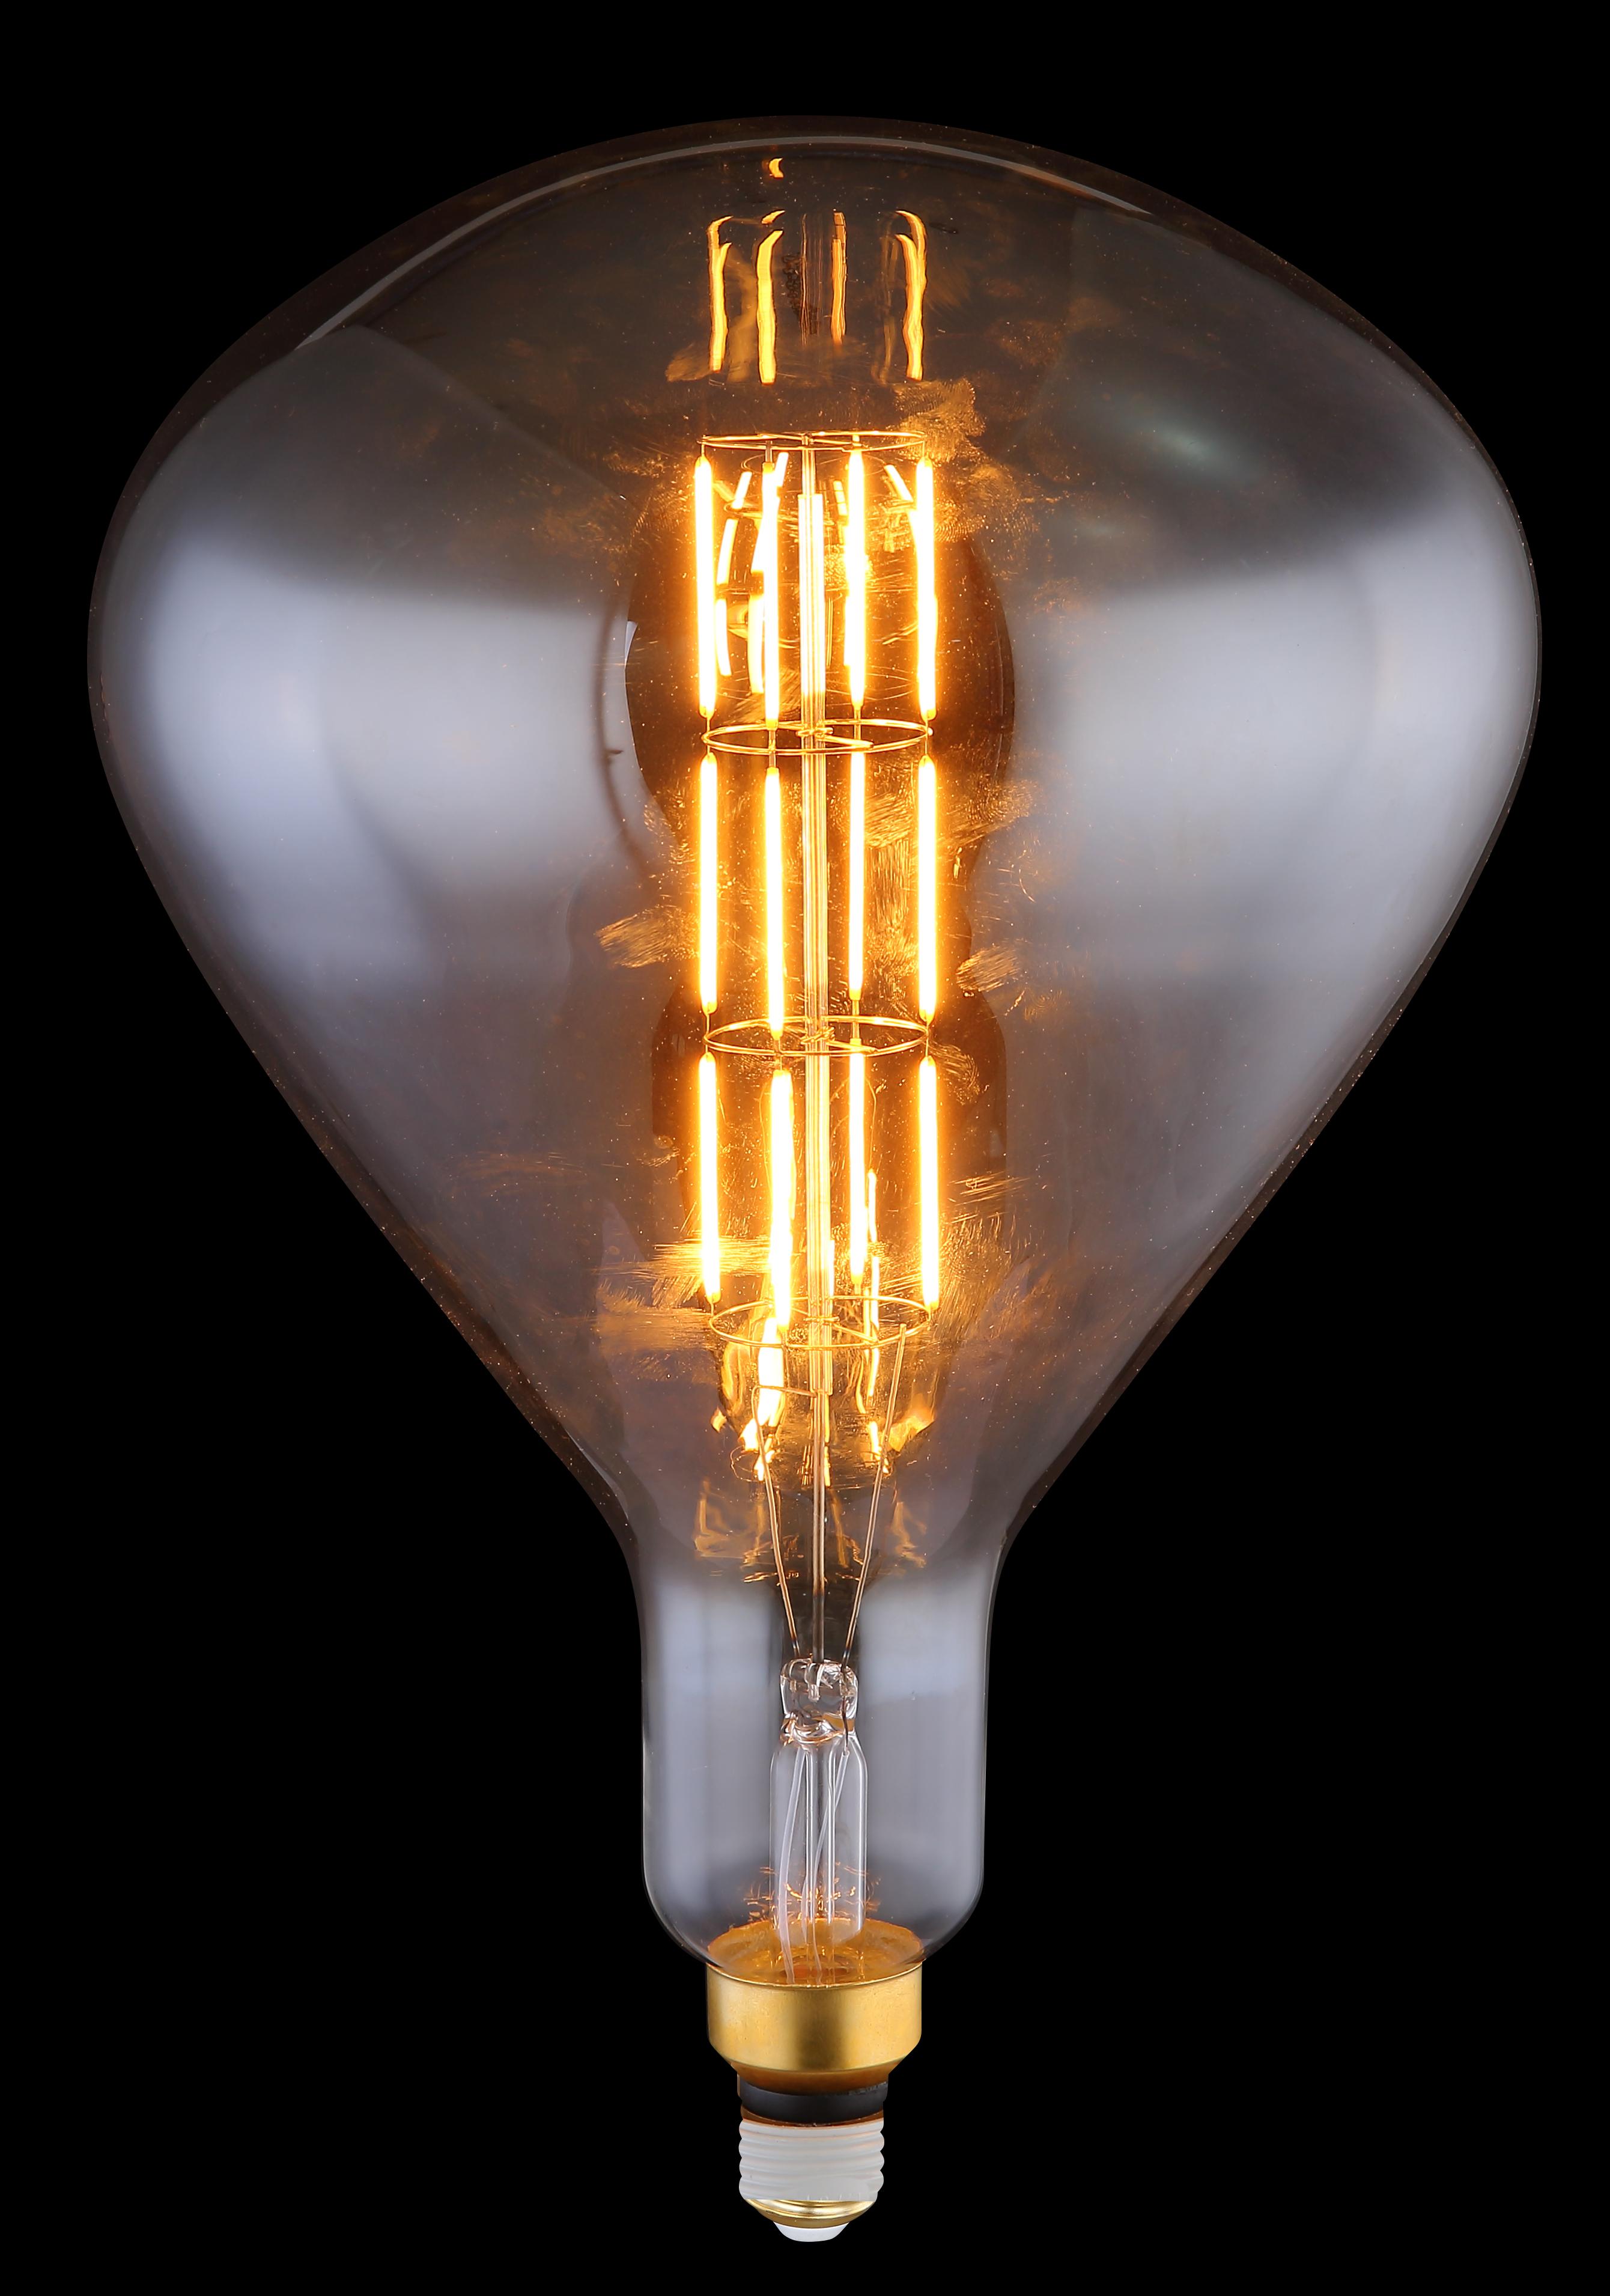 LED Leuchtmittel   Metall messingfarben   Glas rauch   Globo Lighting   Leuchten   Lampen ...